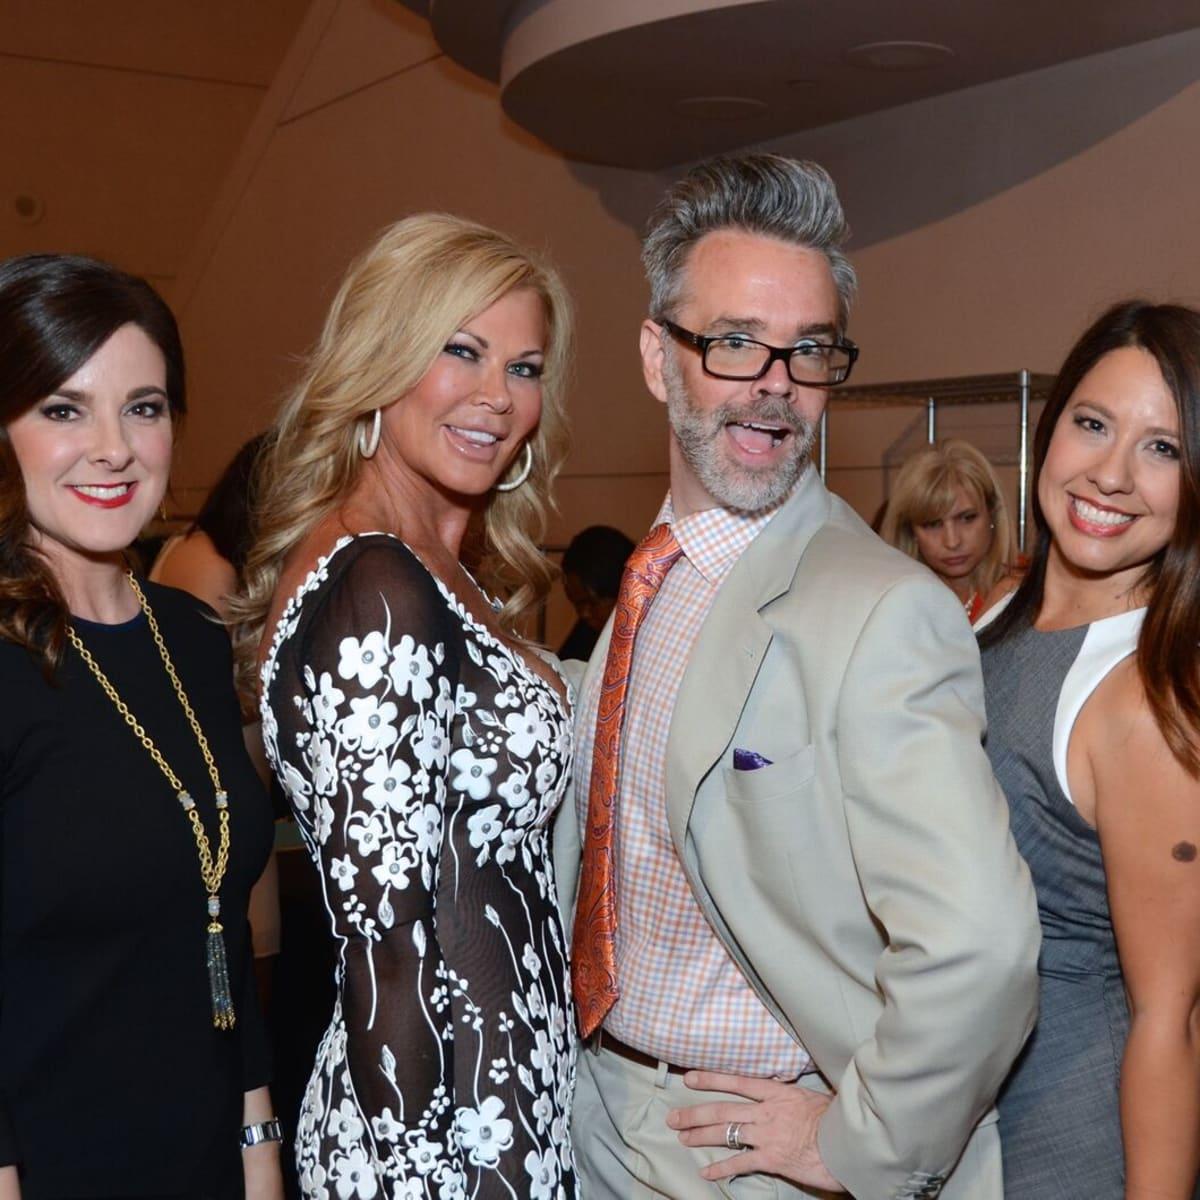 News, Shelby, The Women's Home, Aug. 2015, Elaine Turner, Theresa Roemer, Michael Pearce, Anika Jackson